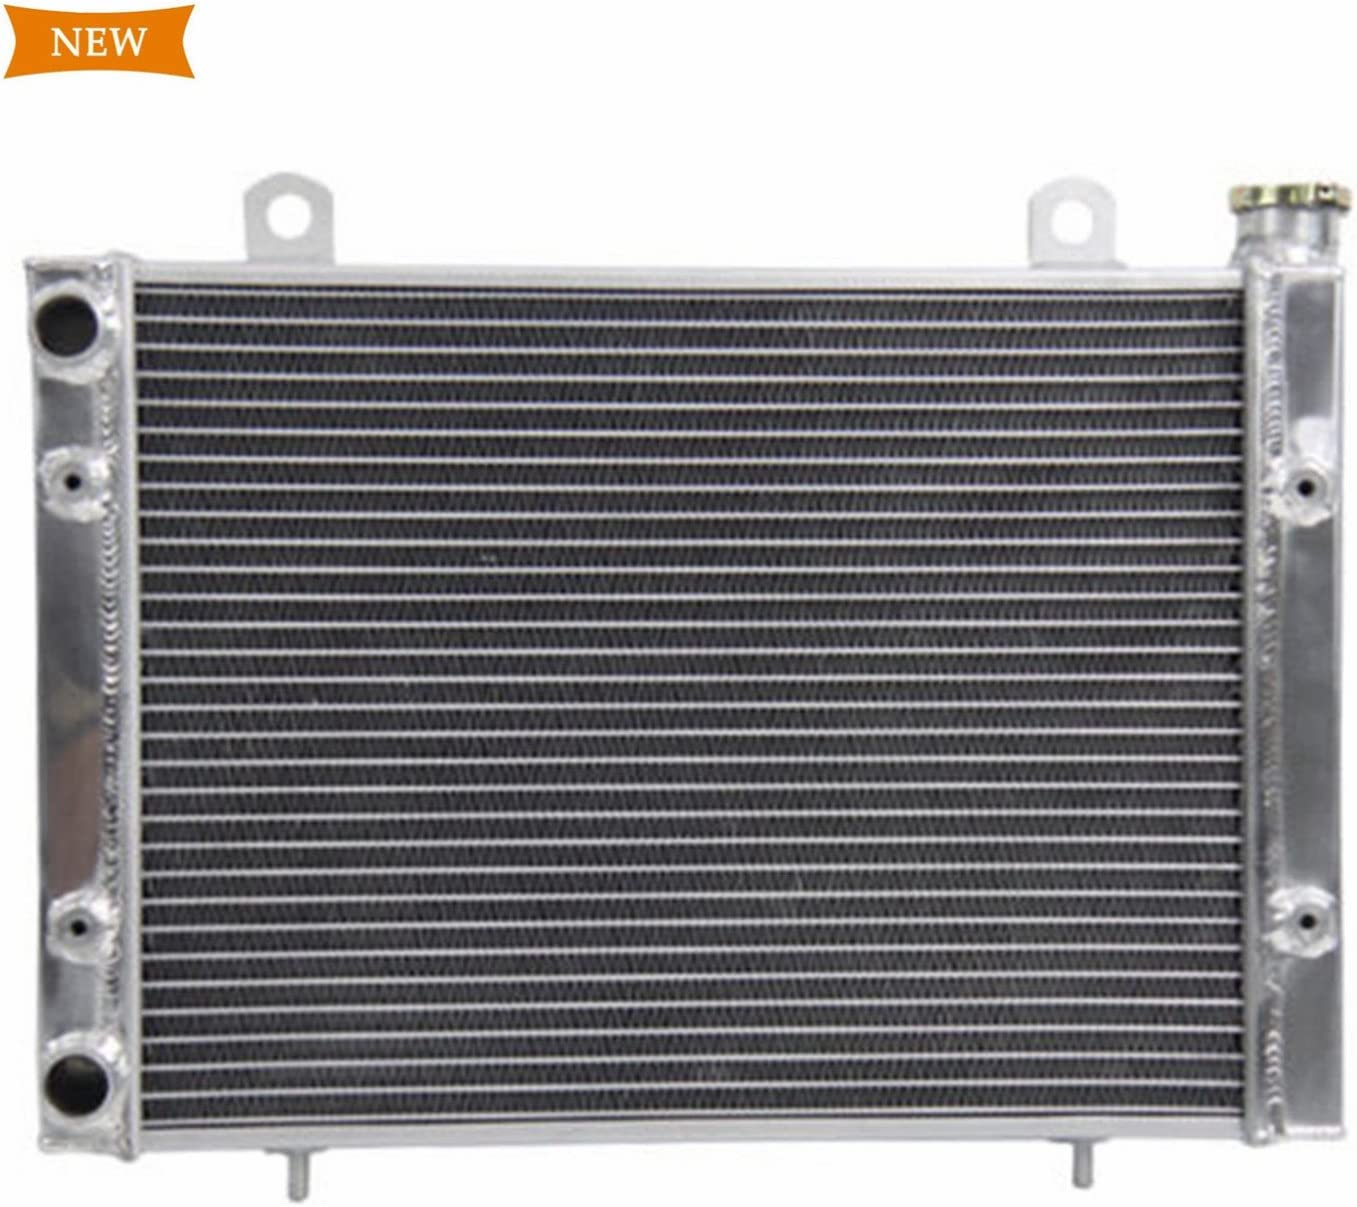 Primecooling Full Aluminum Radiator for 2010-2014 Polaris Ranger 4X4 800 EFI Crew 6x6 (OEM#:1240528,1240527,1240720,124072)